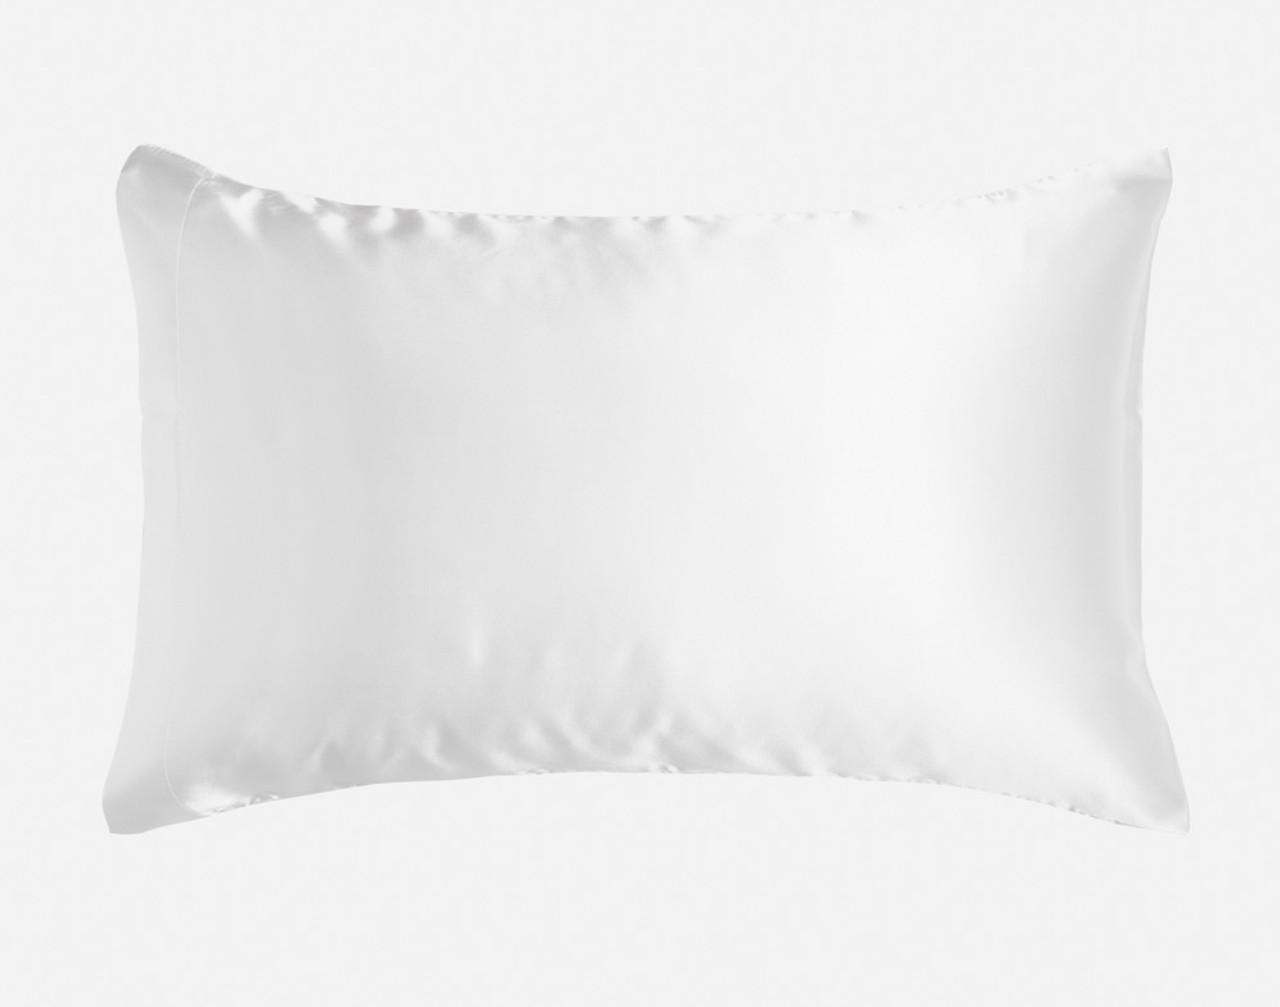 White Pillowcase in Queen size over a pillow